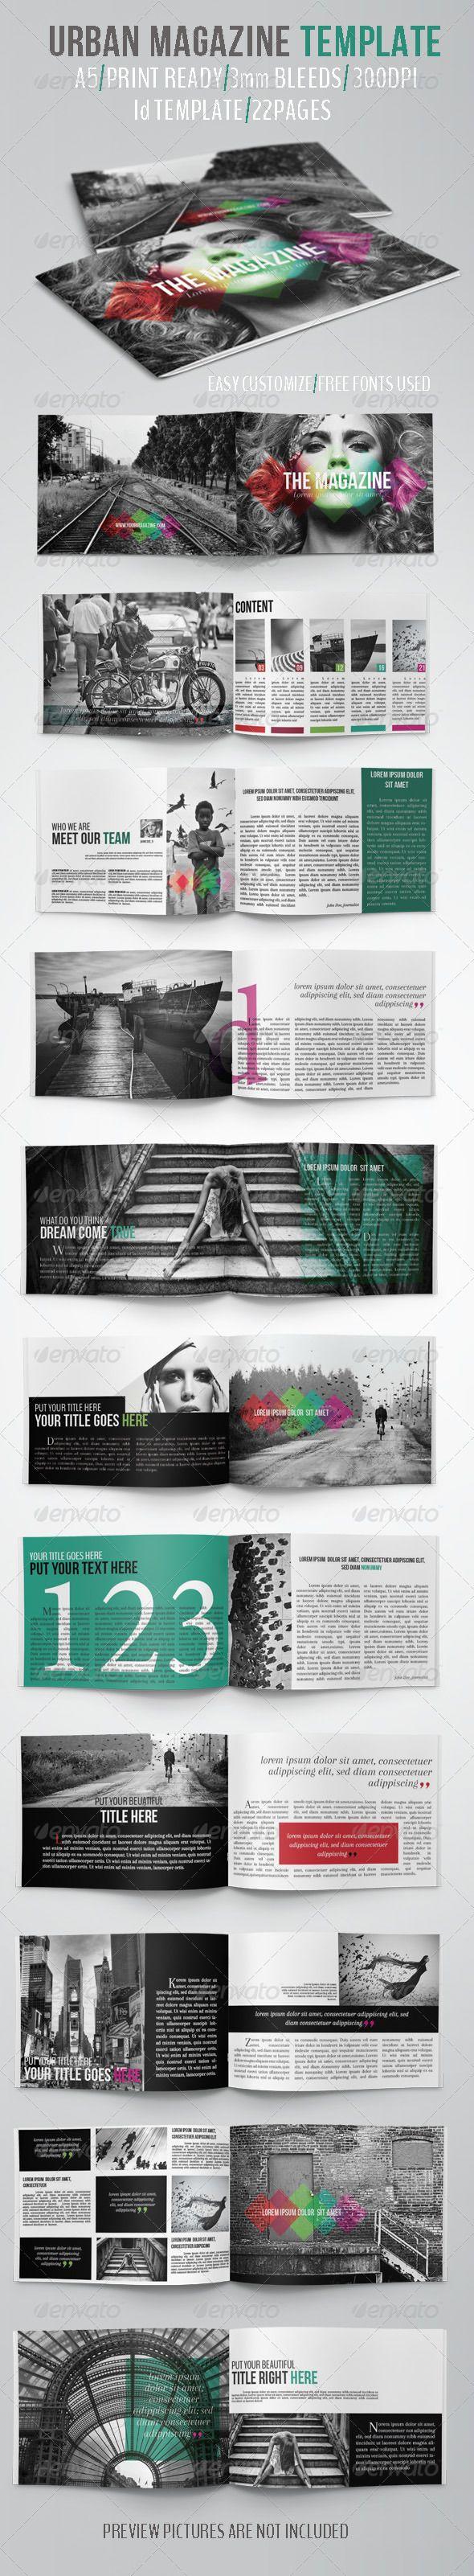 Urban Magazine Template $13